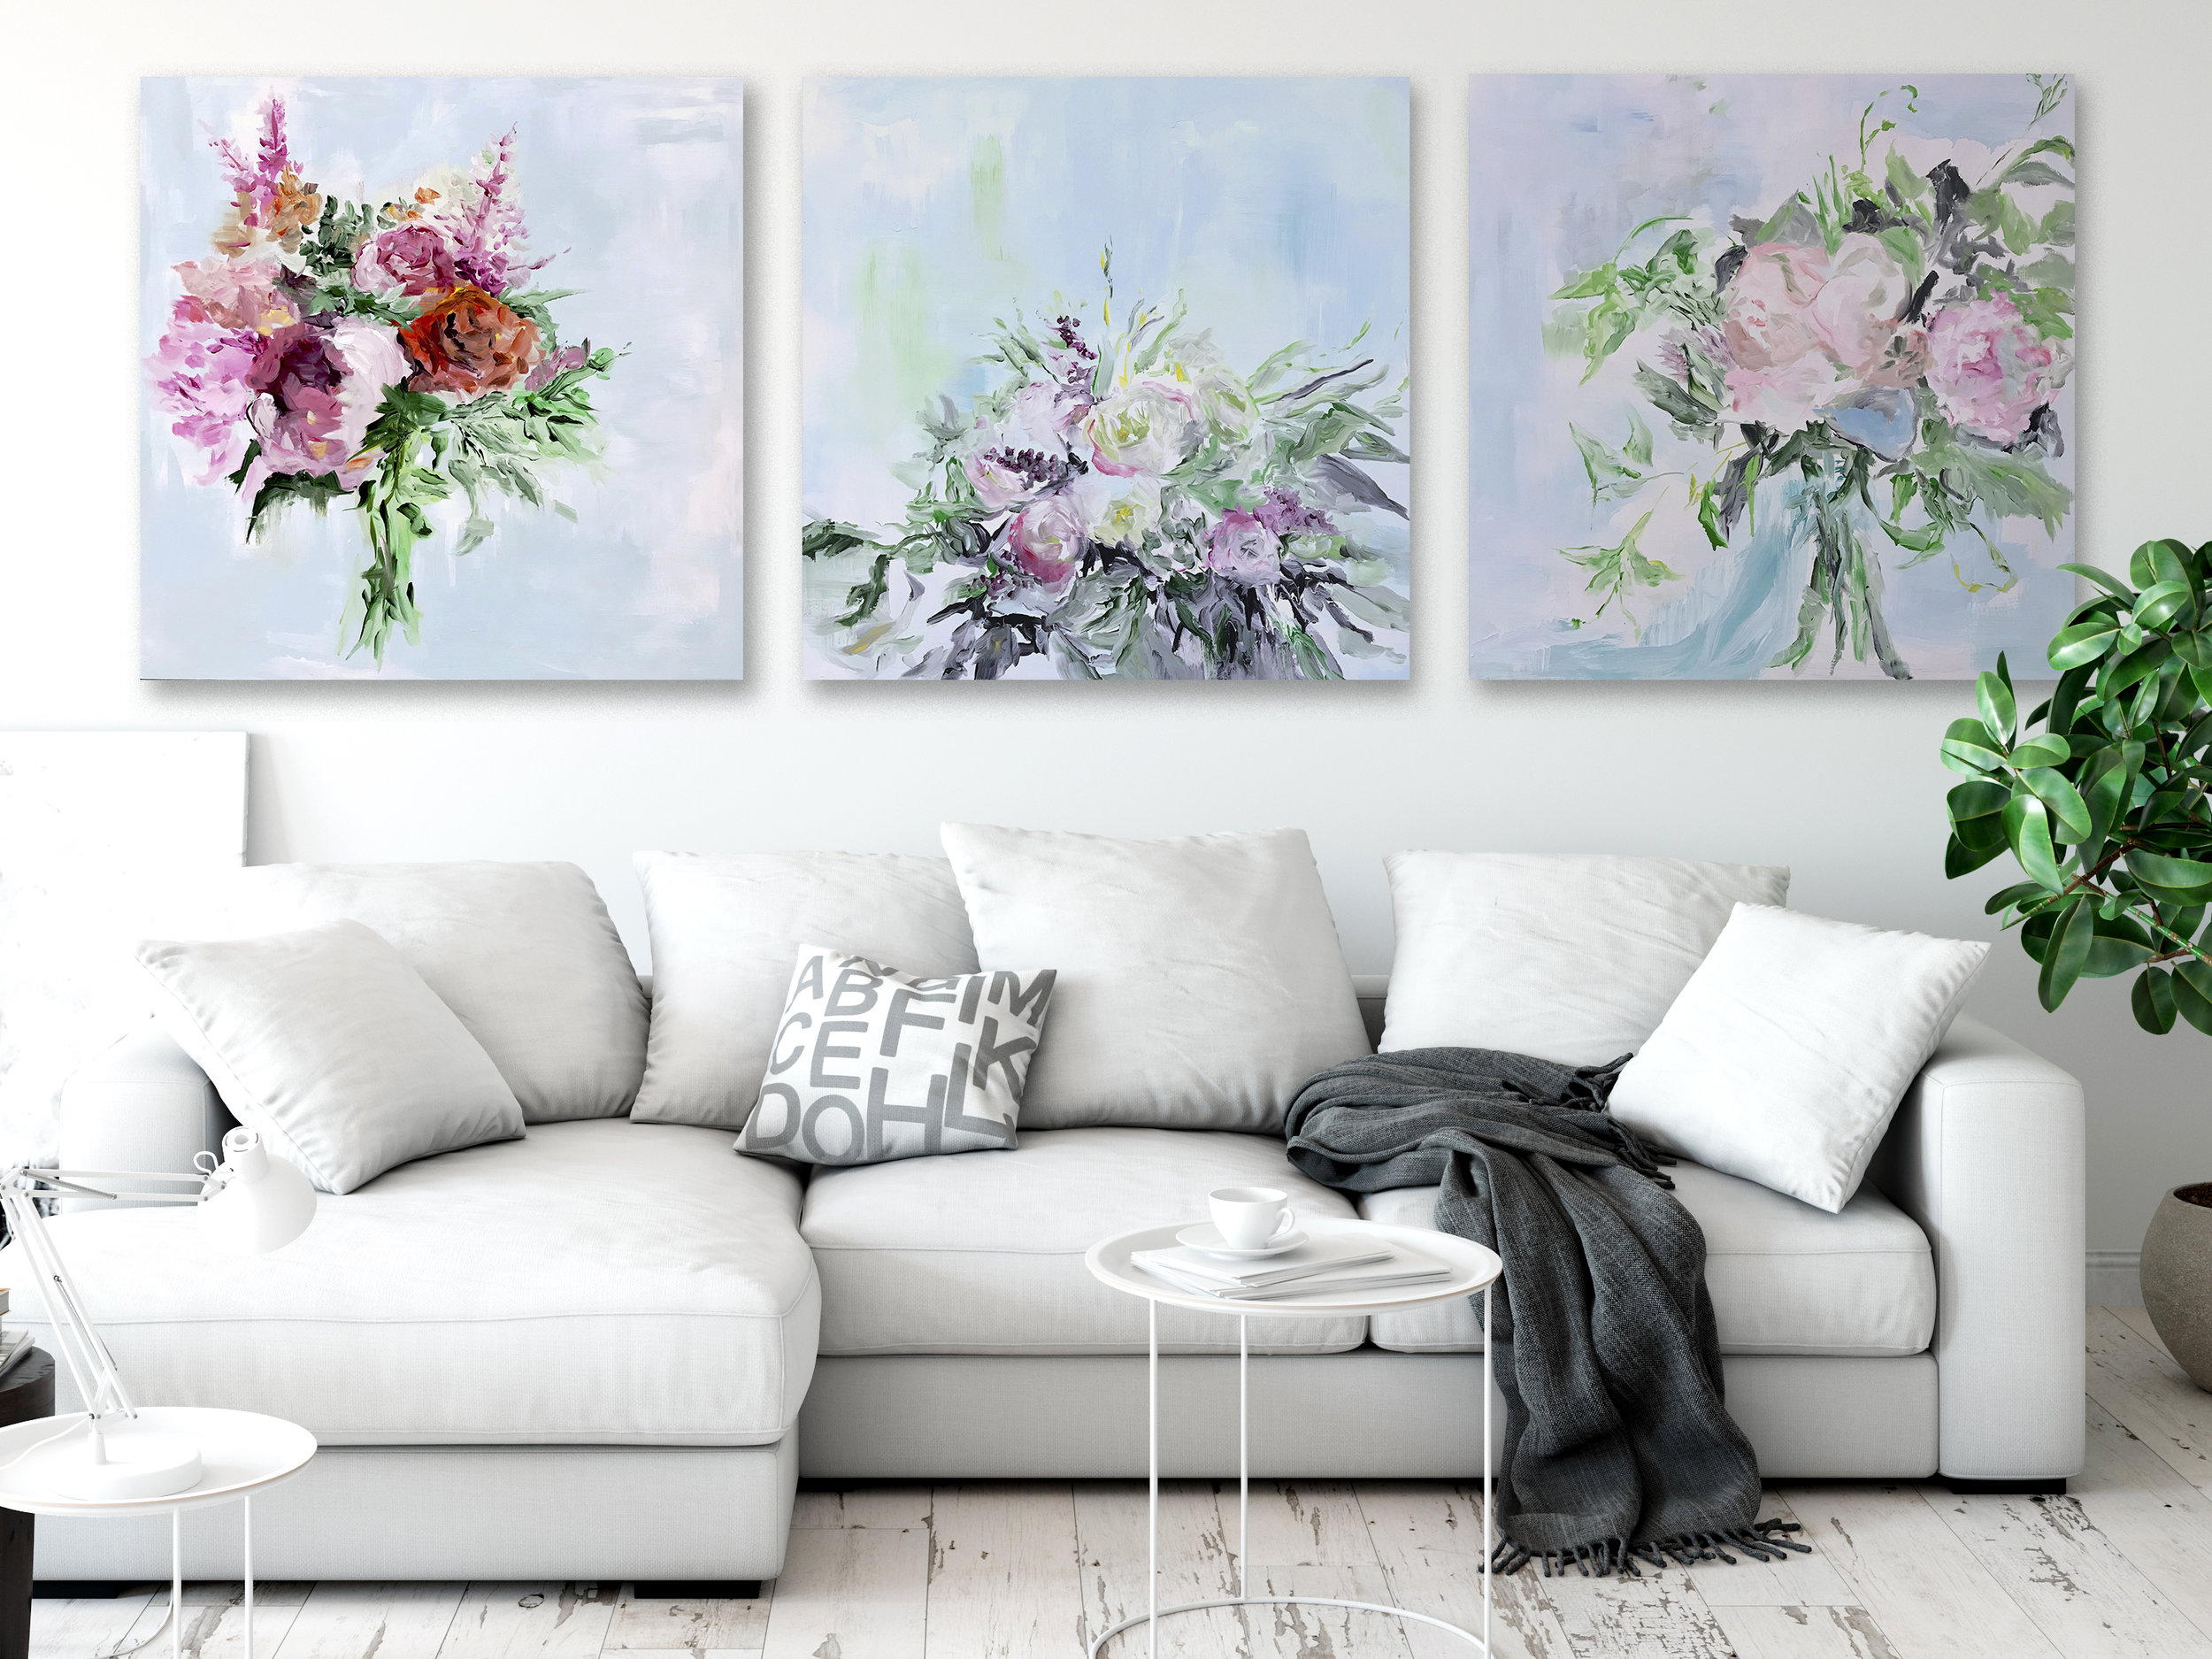 5 petal project large patintings.jpg